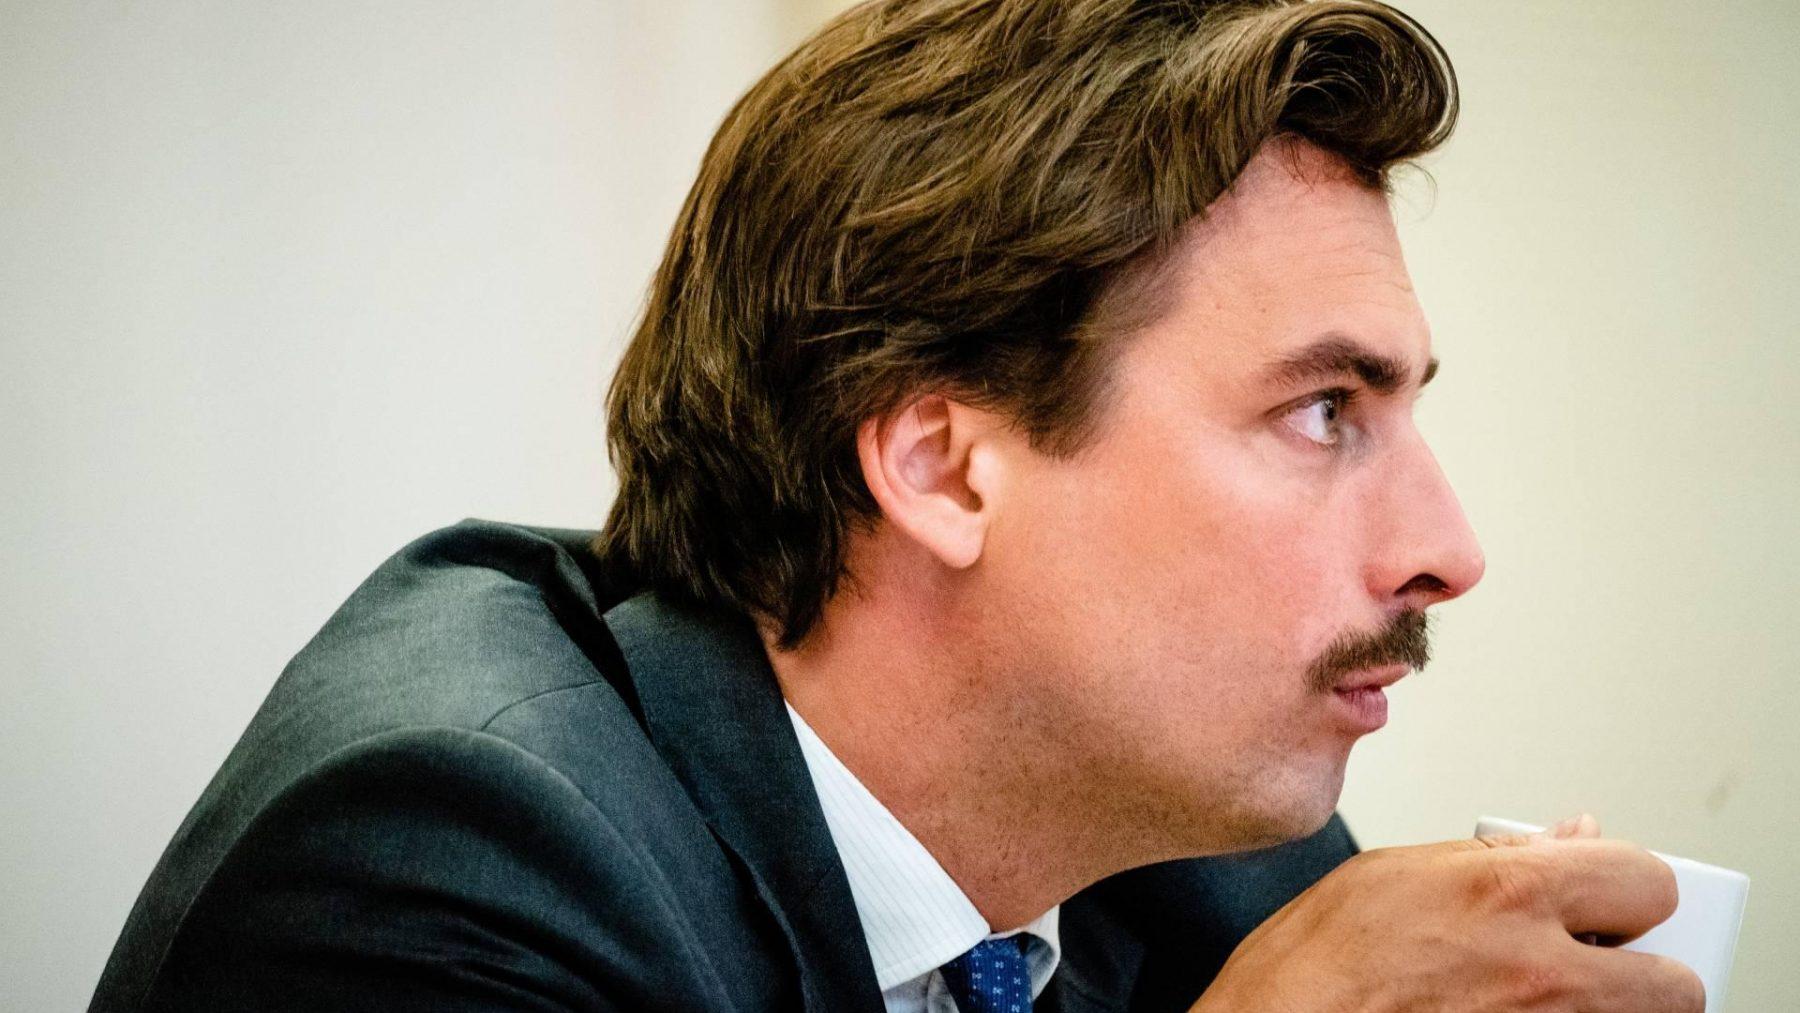 Thierry Baudet maakt NPO-journalist Joost Vulling uit